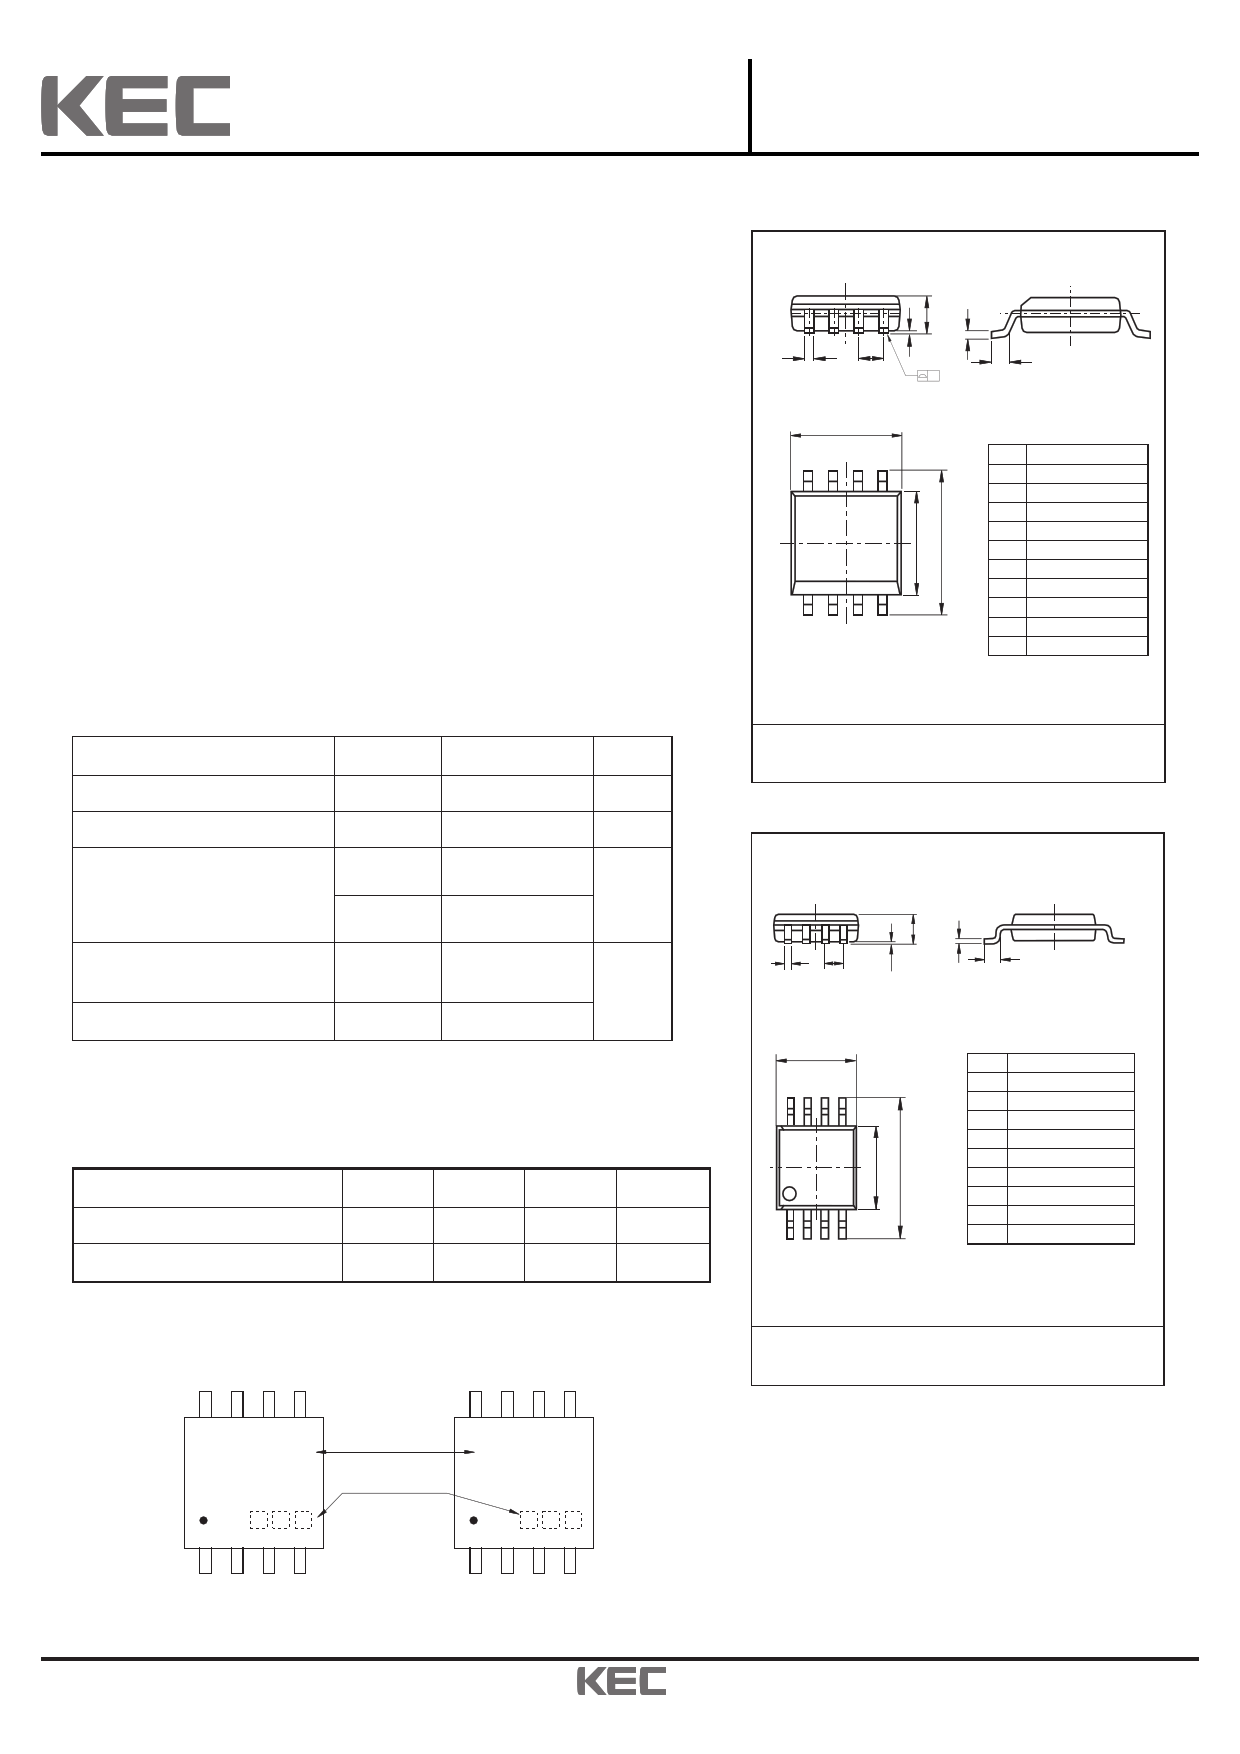 KIC6971MF Datasheet, KIC6971MF PDF,ピン配置, 機能